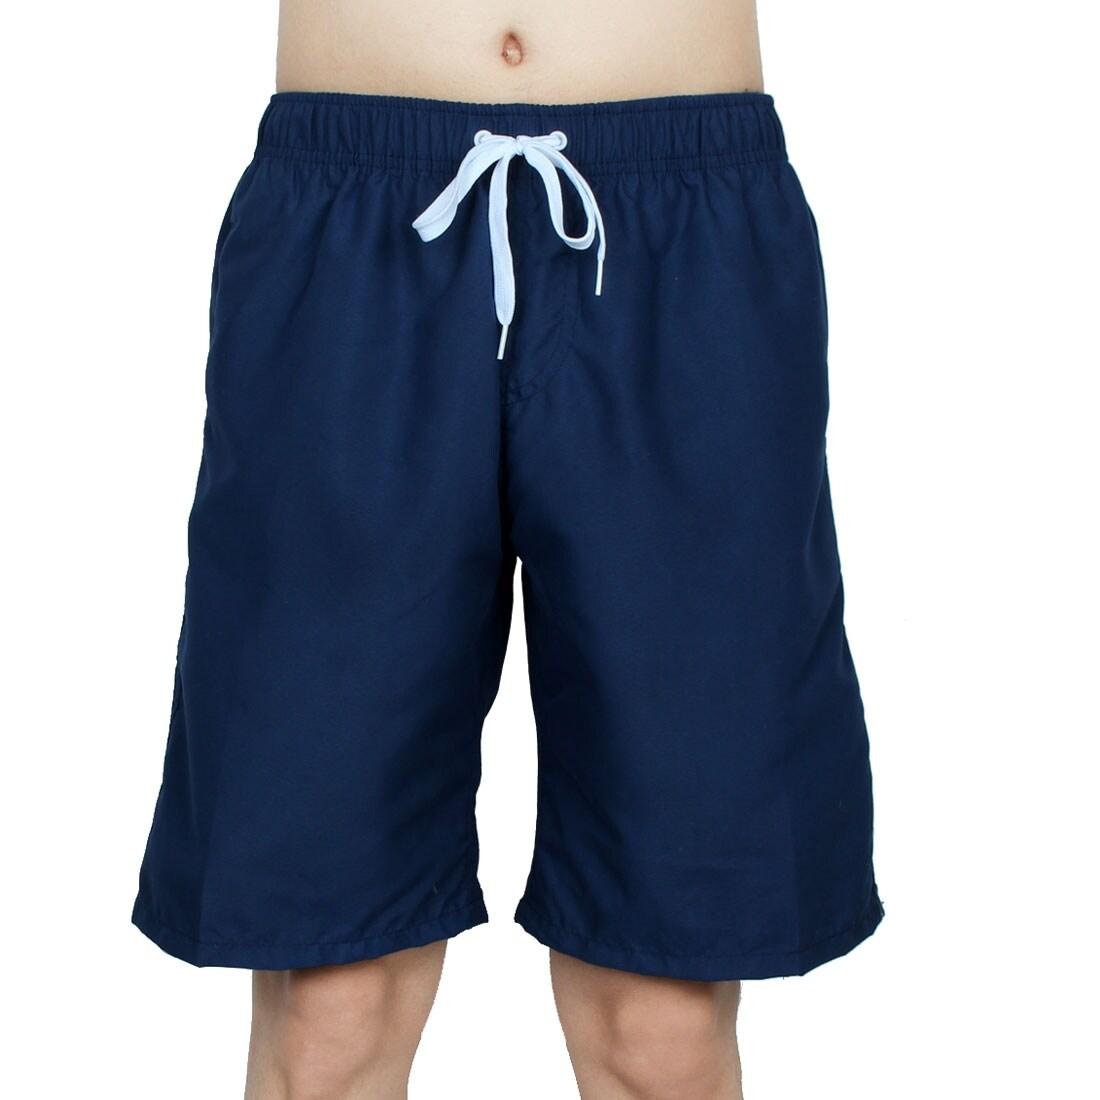 46657de91c Chetstyle Authorized Adult Men Summer Swimming Shorts Swim Trunks Navy Blue  W 34